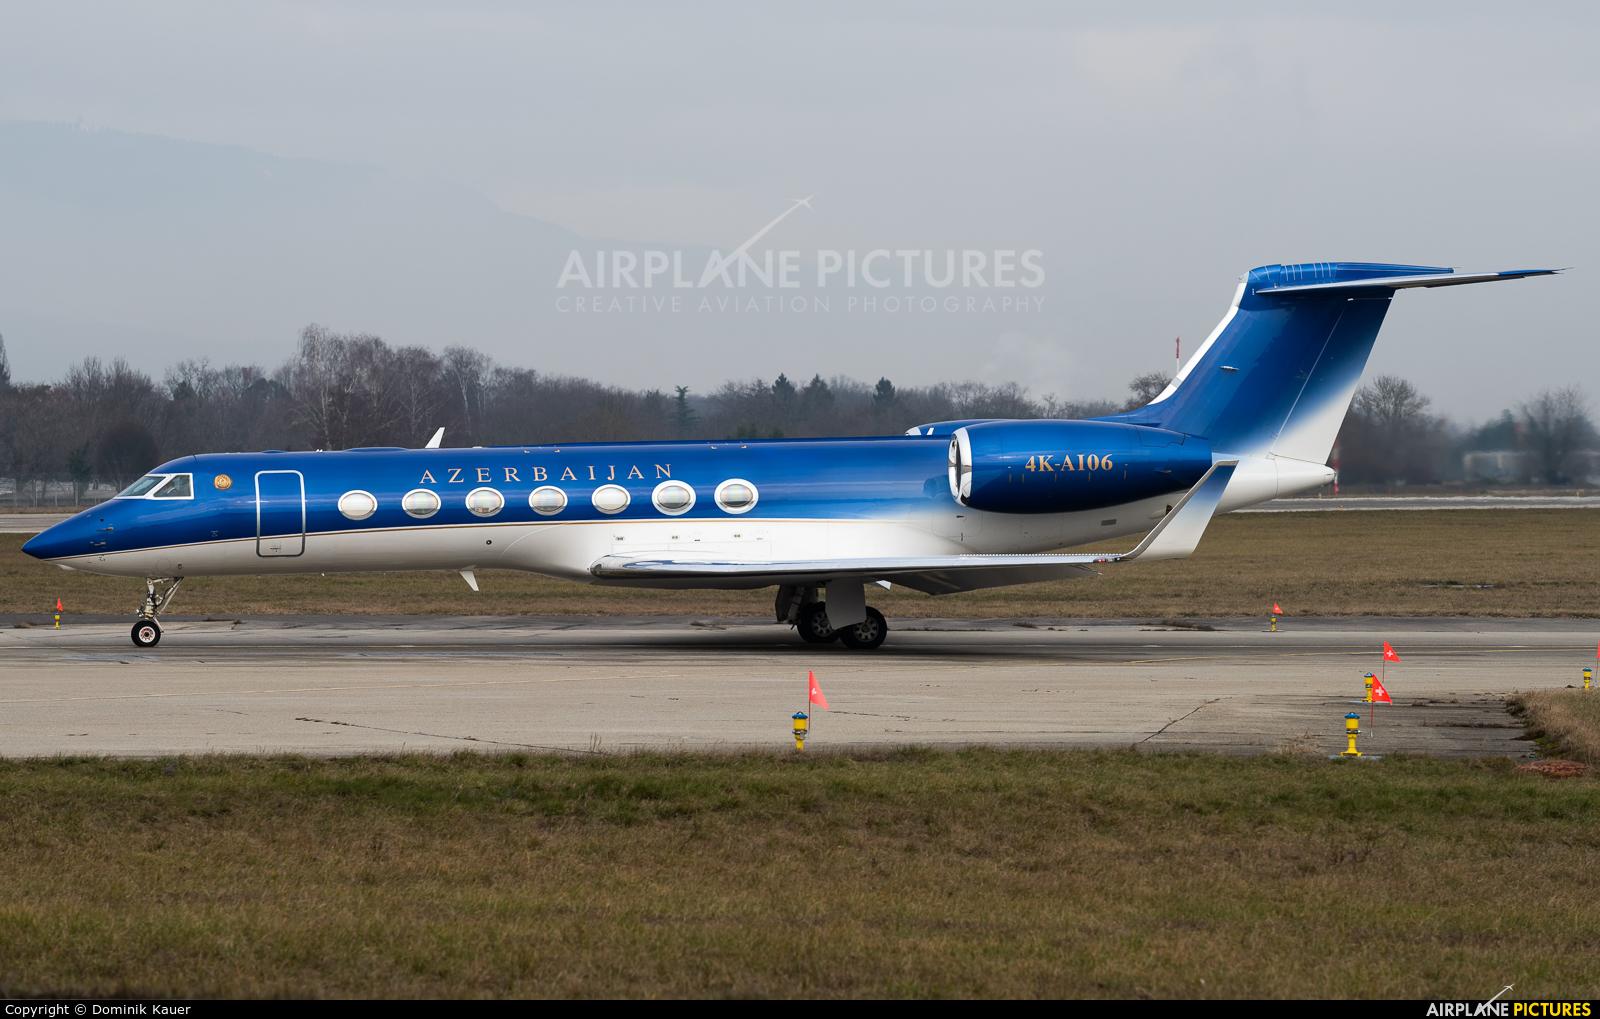 Azerbaijan - Government 4K-AI06 aircraft at Geneva Intl